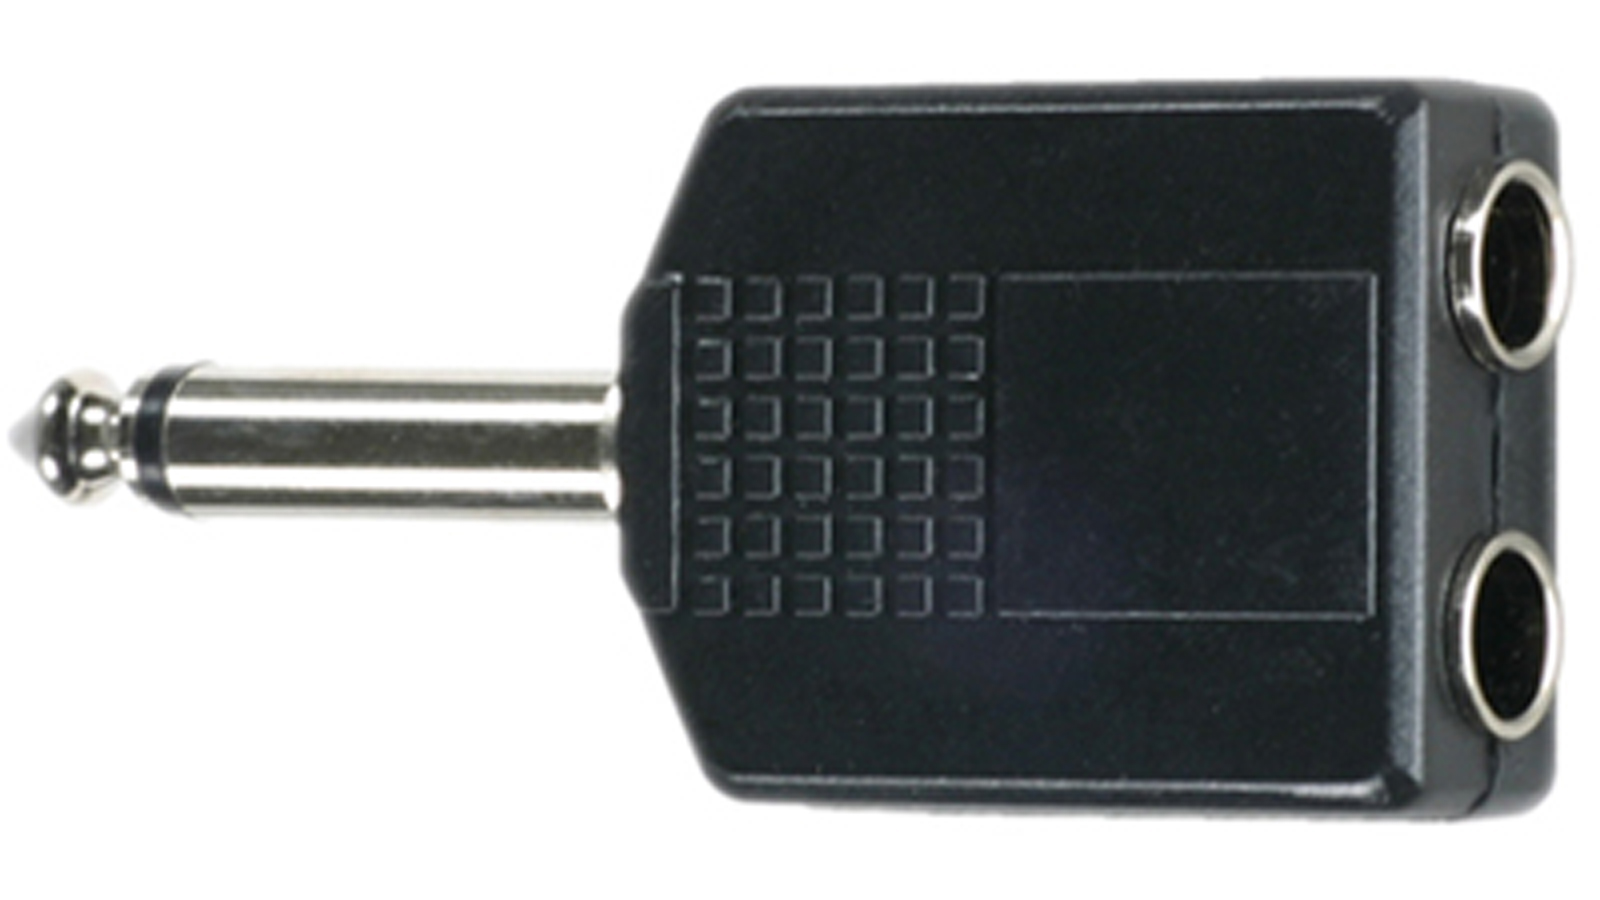 DREITEC 2 x Klinkenbuchse Mono auf 1 x 6,3 mm Klinke Mono Adapter 1852